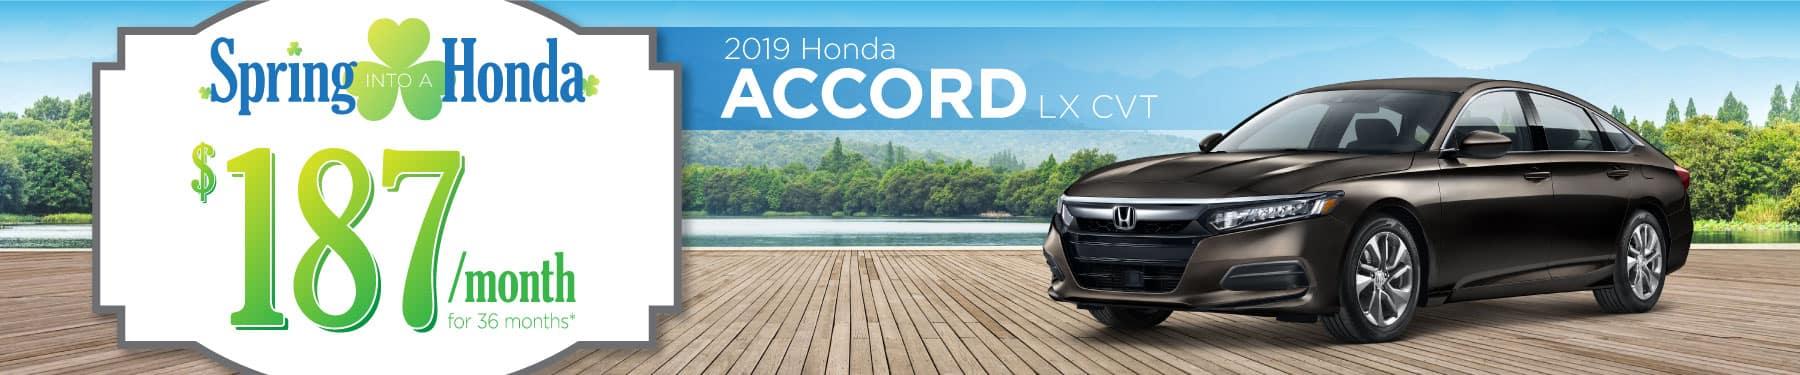 Header Photo of the 2019 Honda Accord